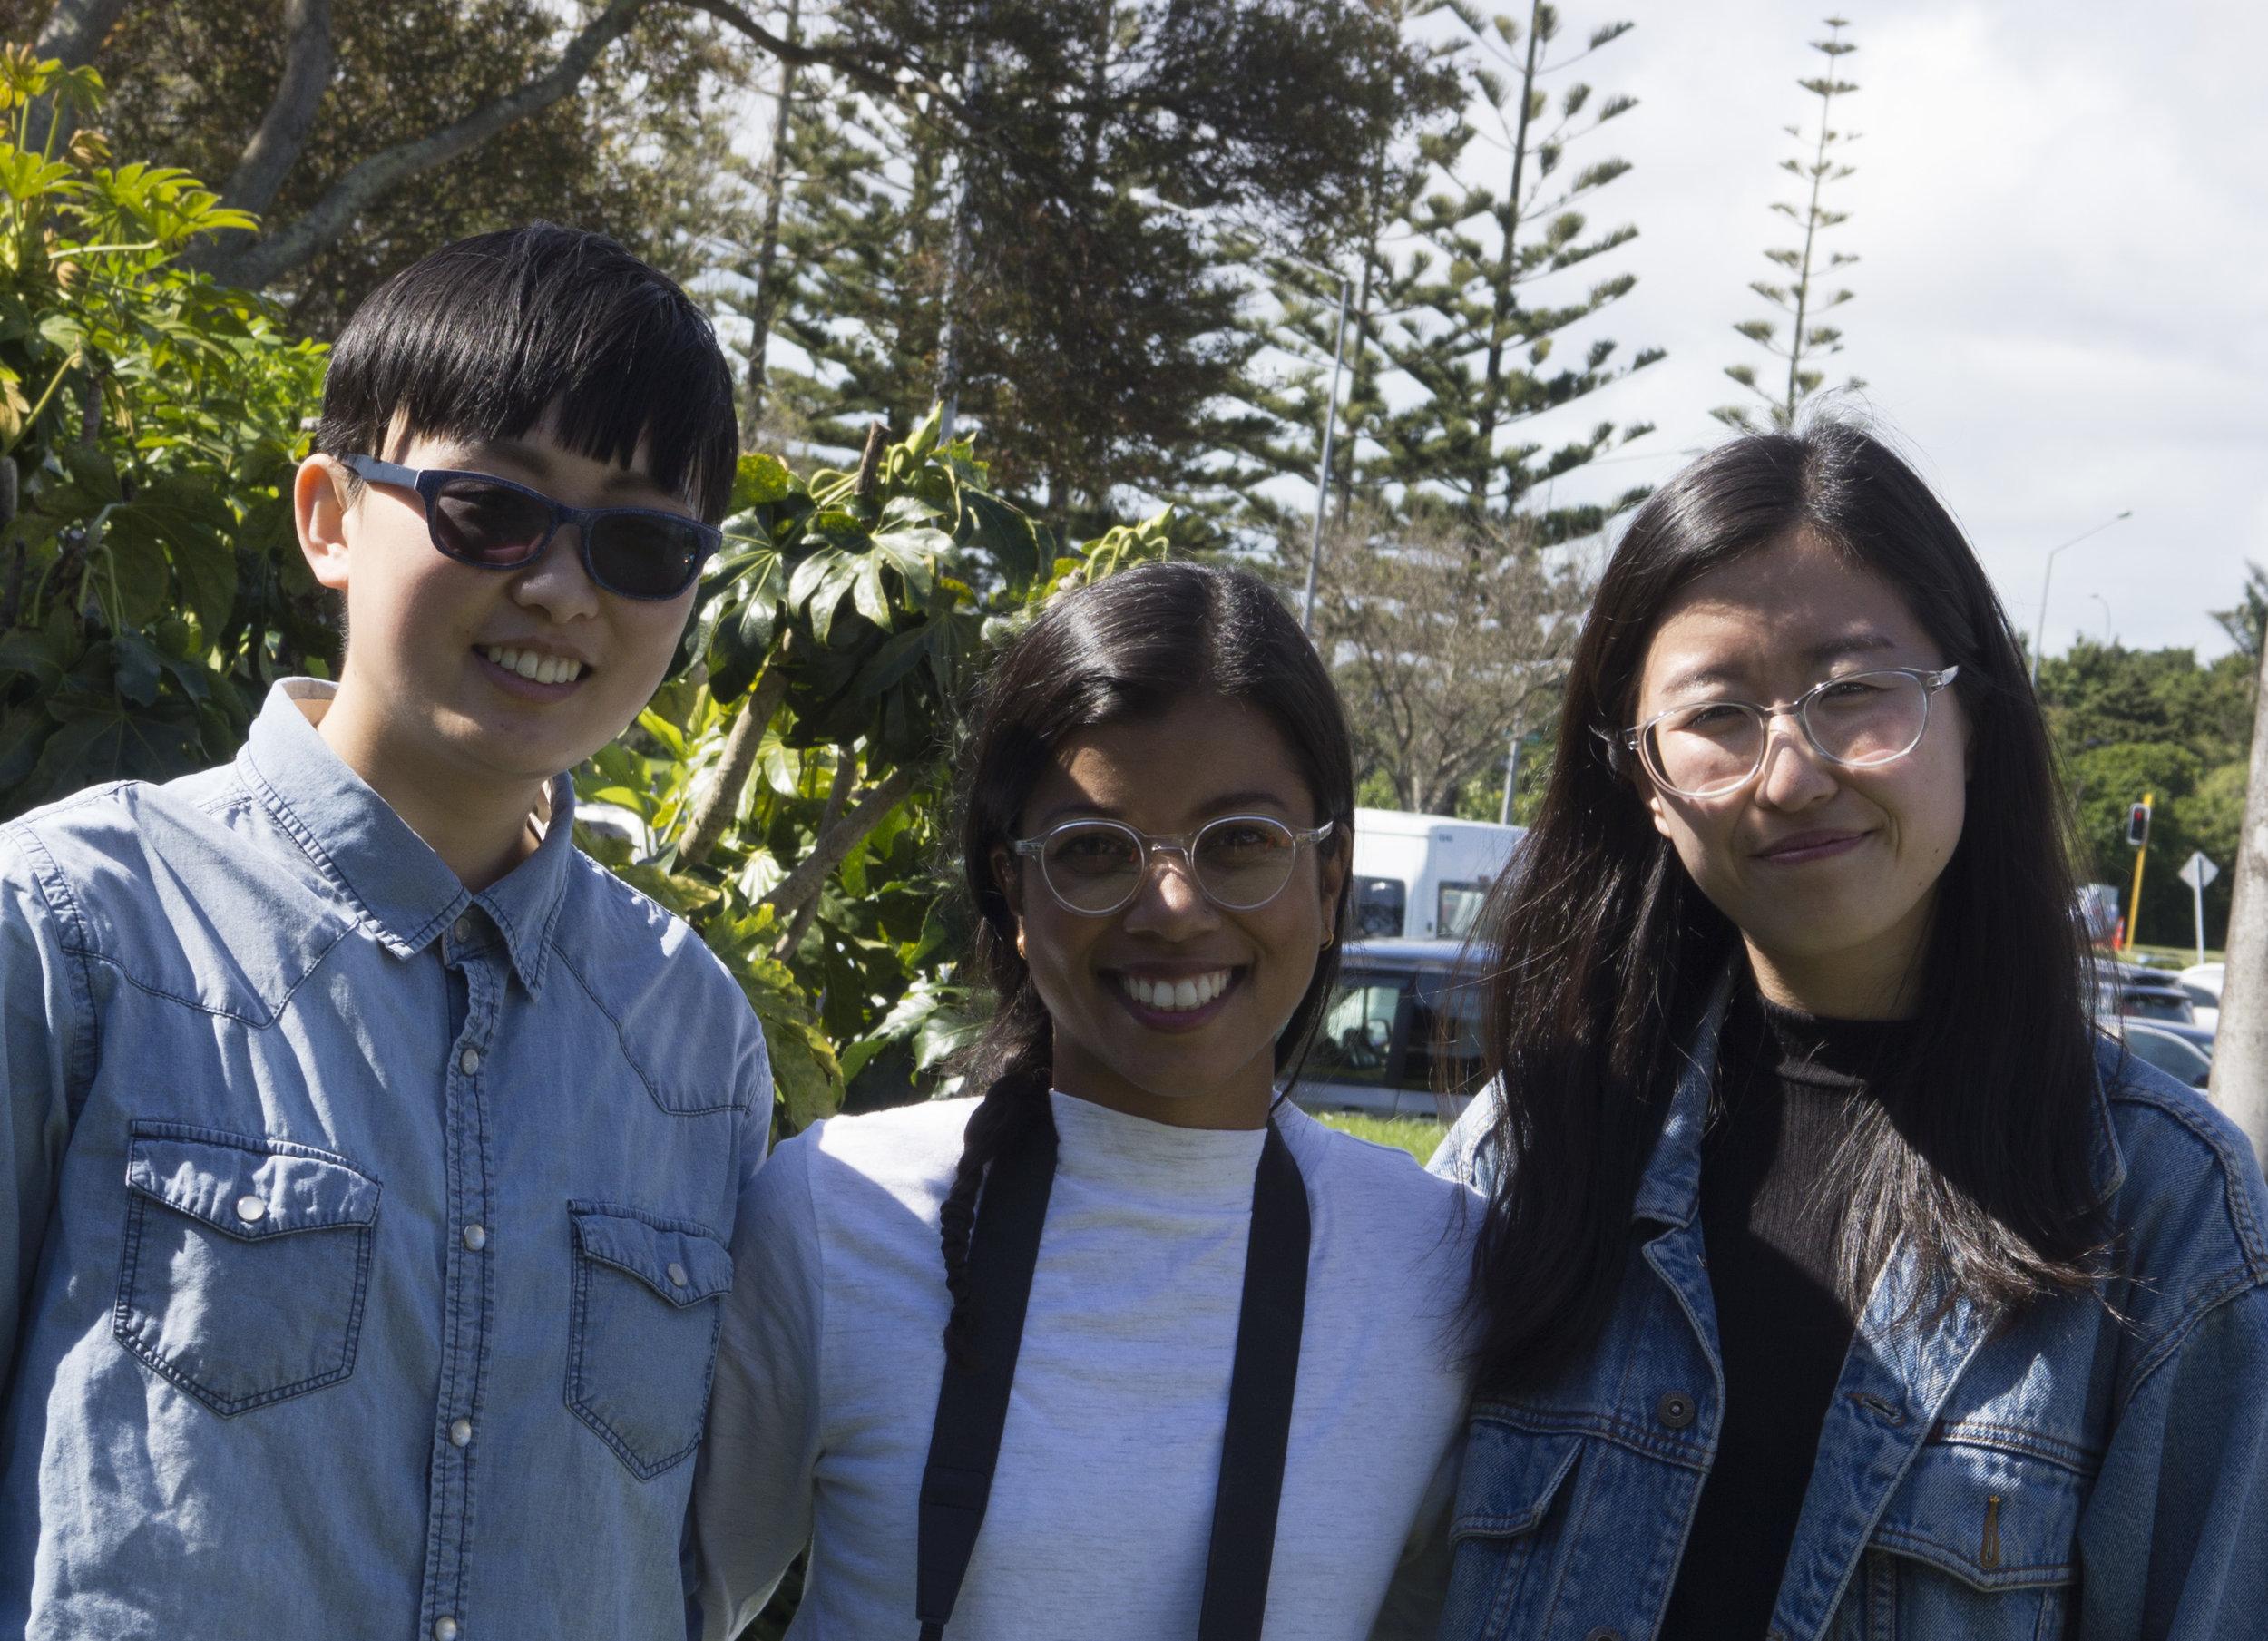 Shivani Karan with Youth Project Coordinators from Shakti Youth, New Zealand